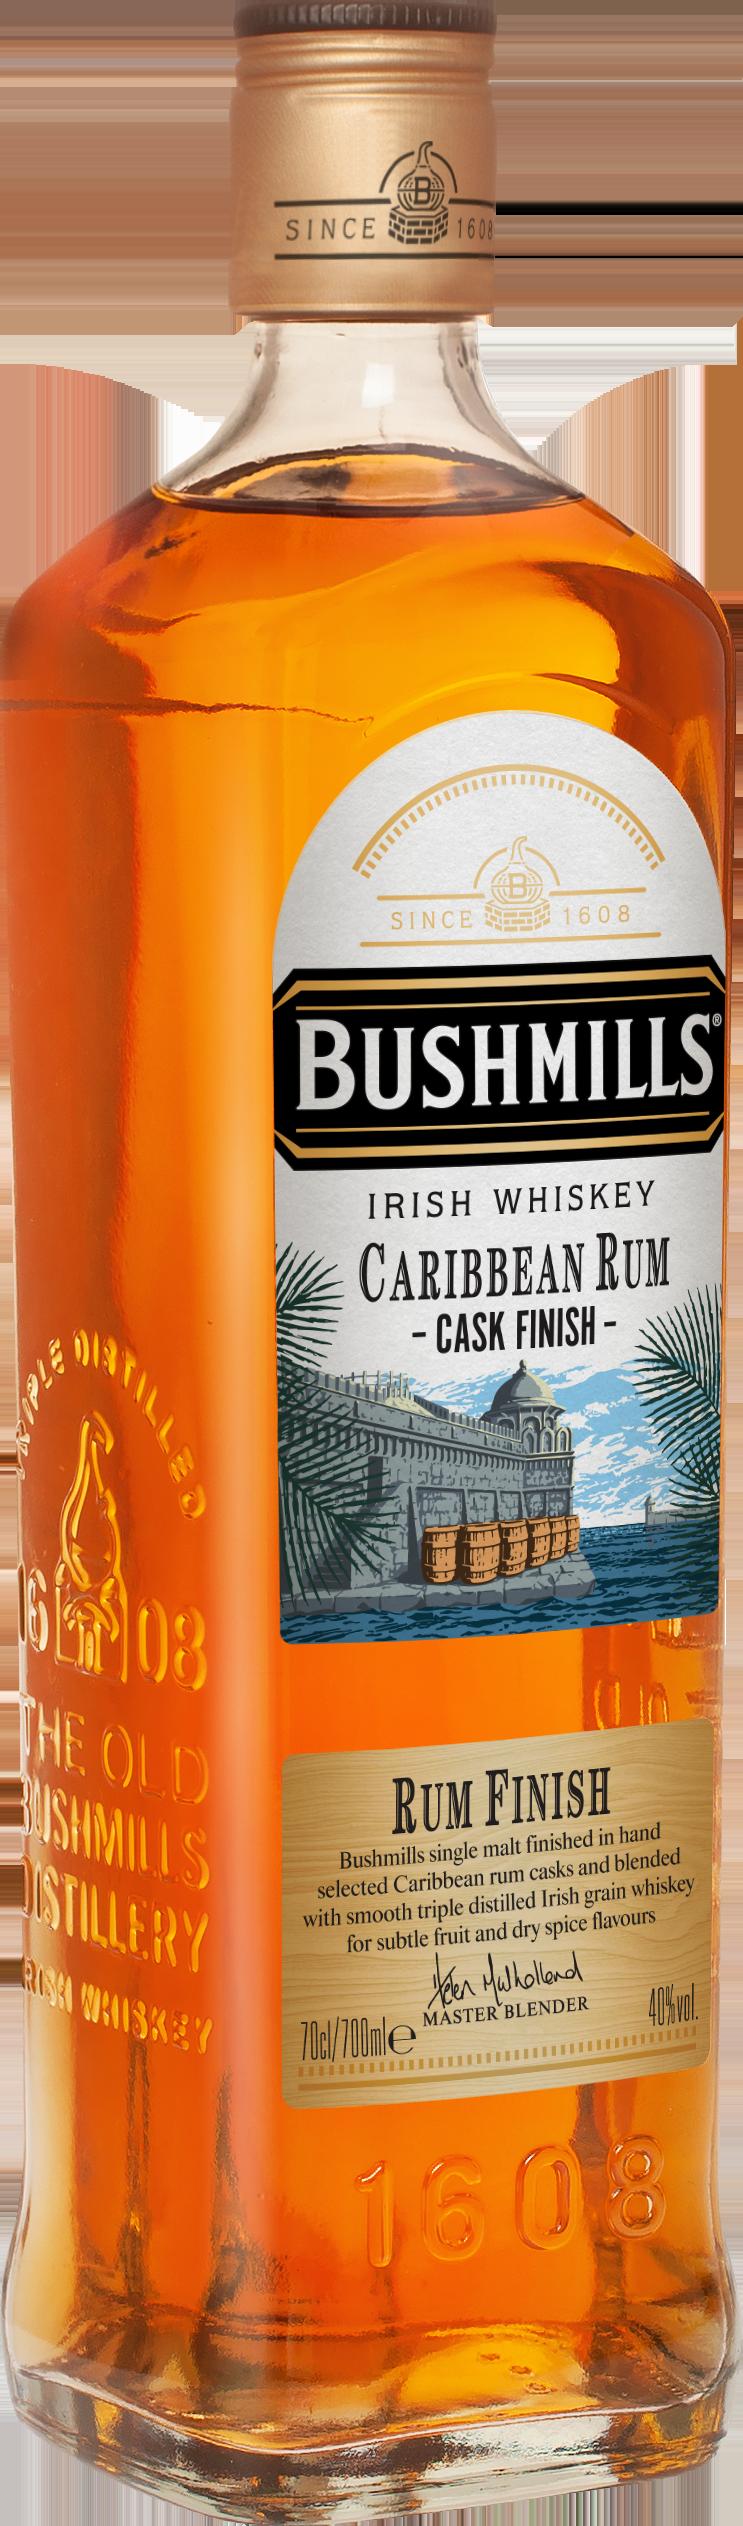 Bushmills Carribean Rum Cask Finish 700ml